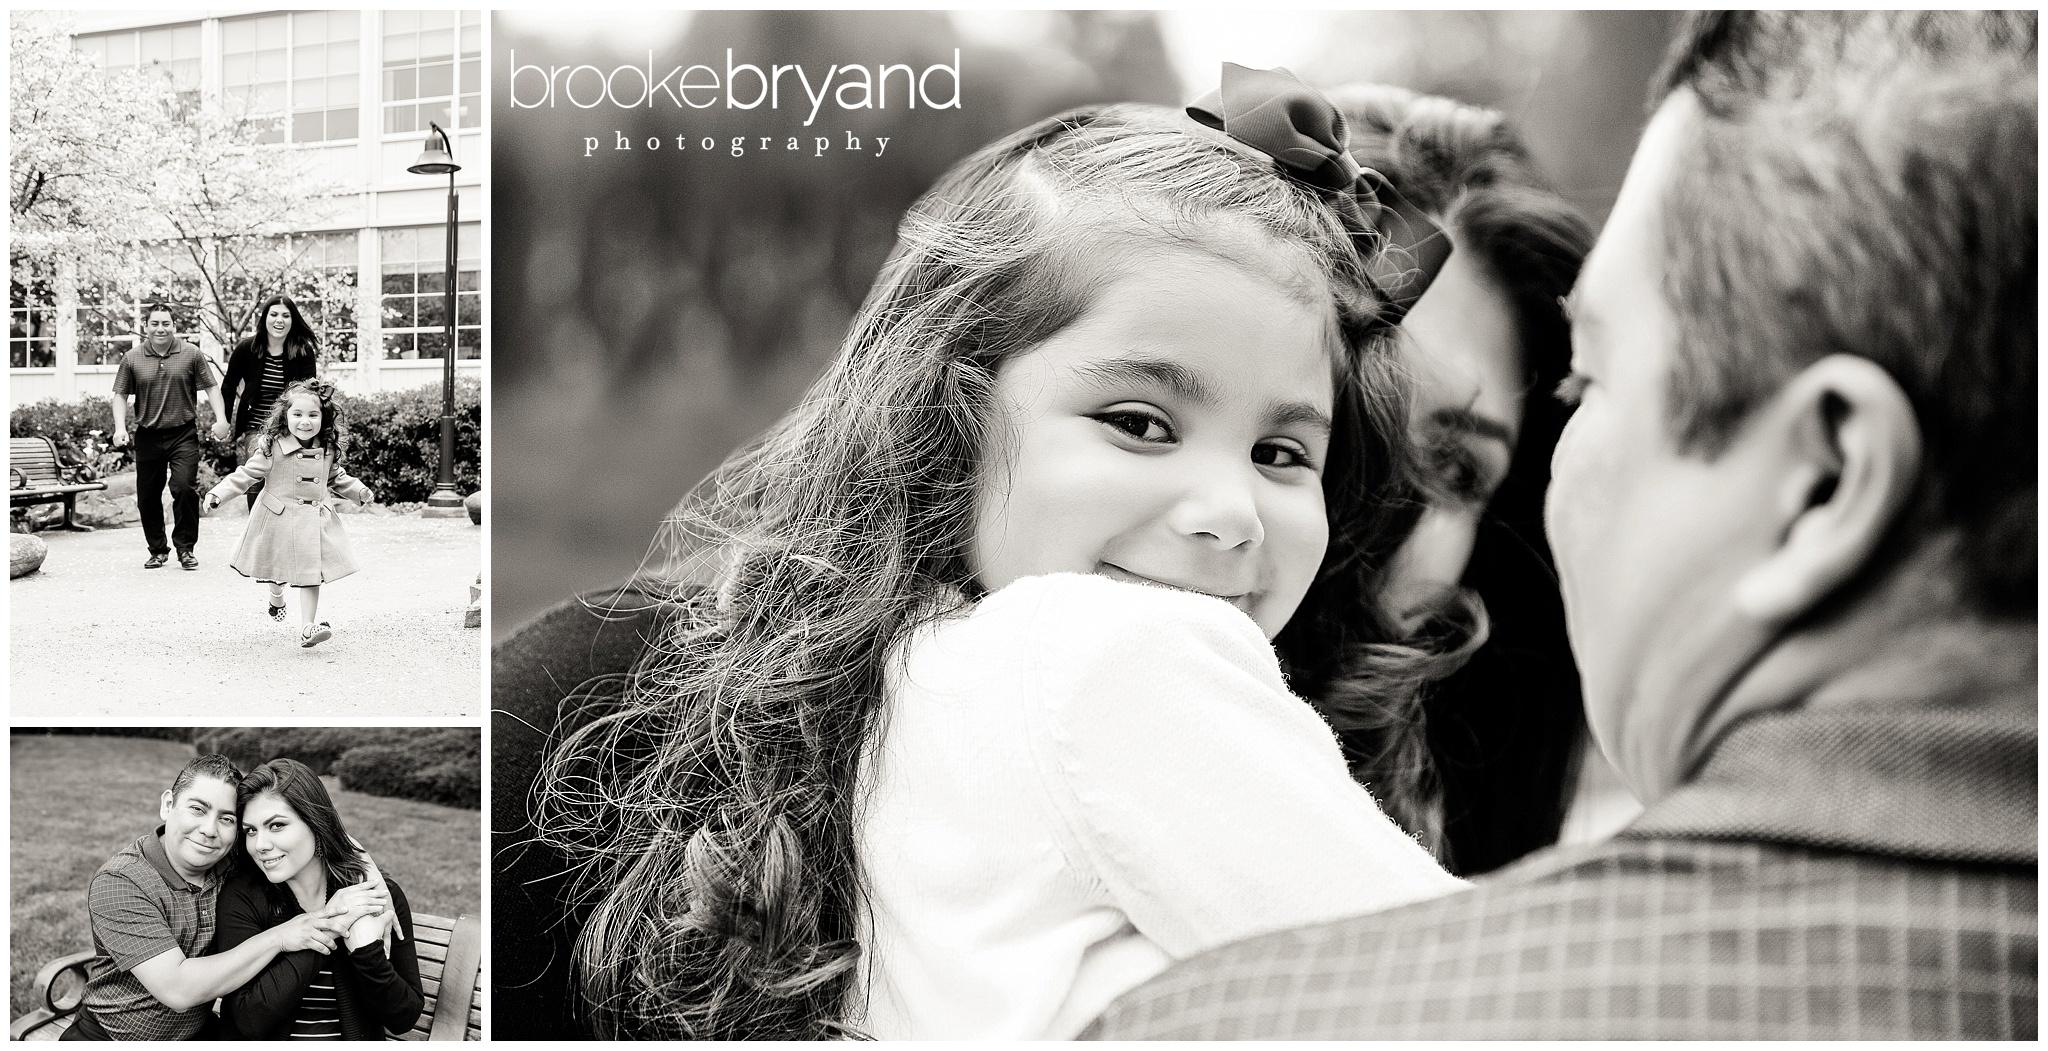 04.2016-Raleigh-Family-Photographer-Brooke-Bryand-Photography-BBP_5079_r1.jpg